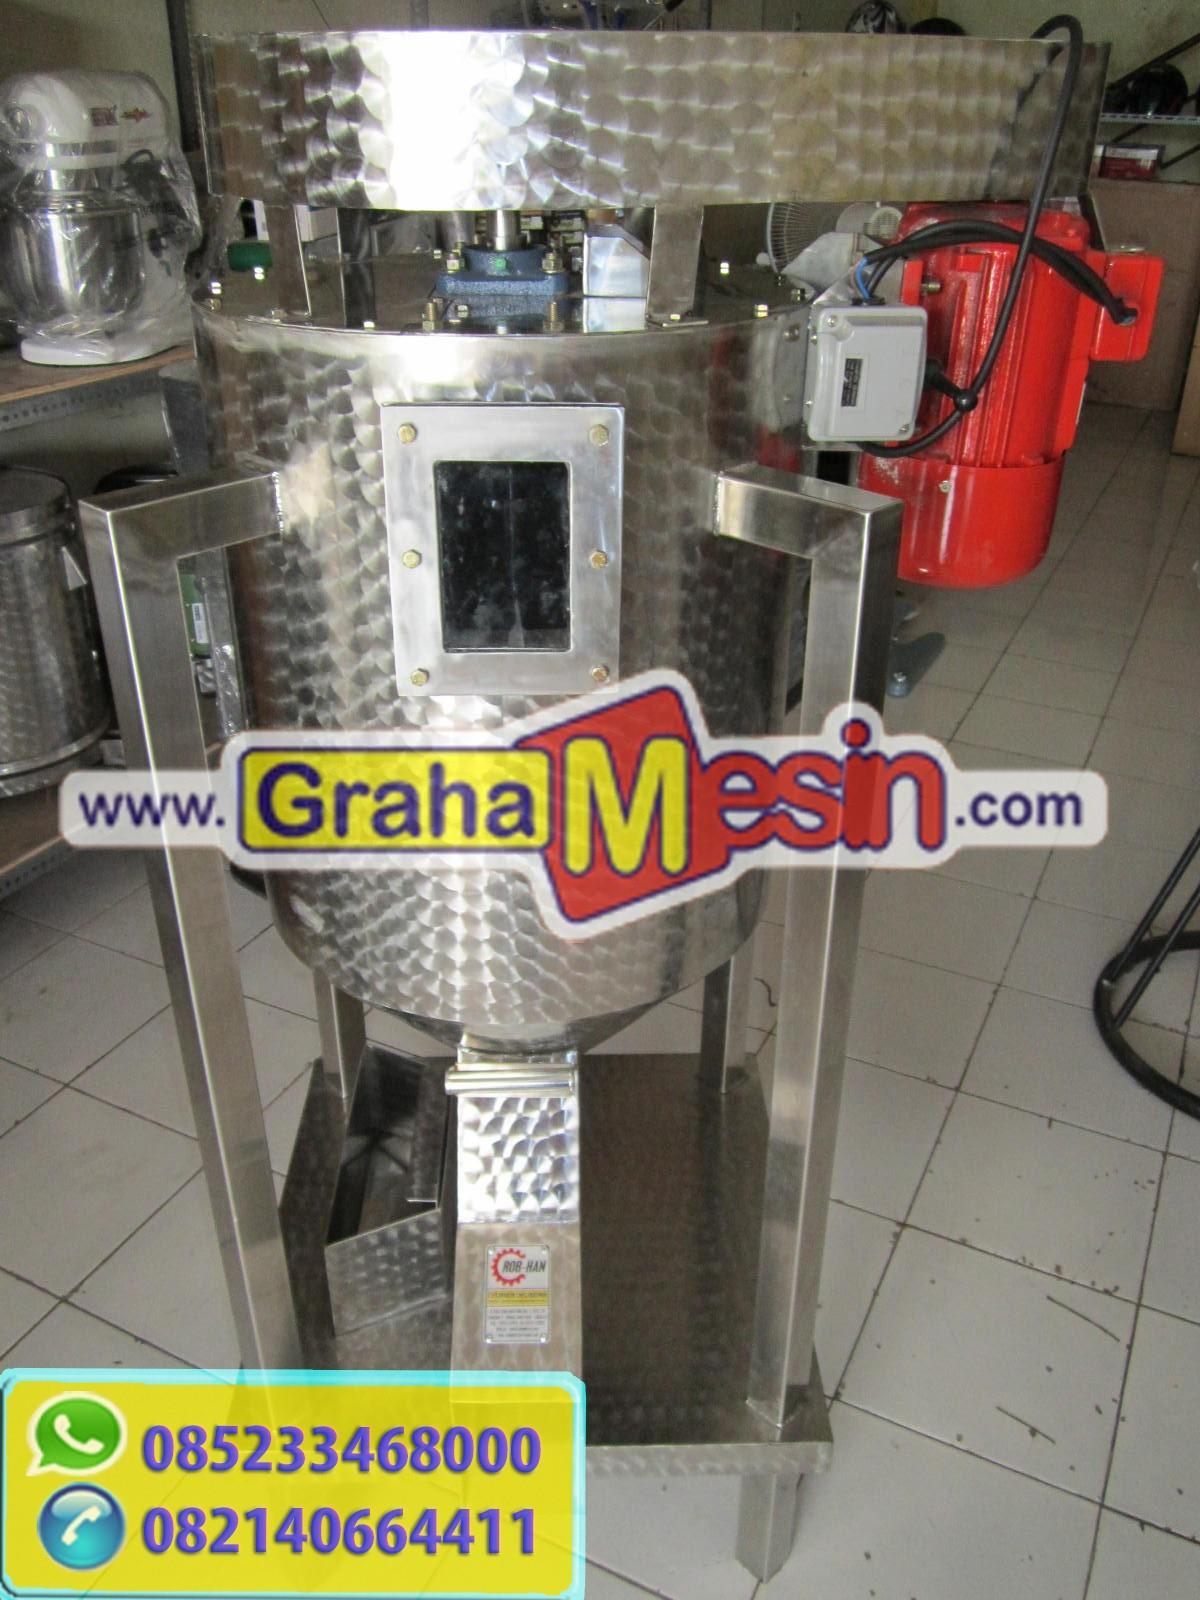 Sell Automatic Pellet Vertical Mixer From Indonesia By Cv Graha Van Belt Utk Mesin Steam Globalindocheap Price